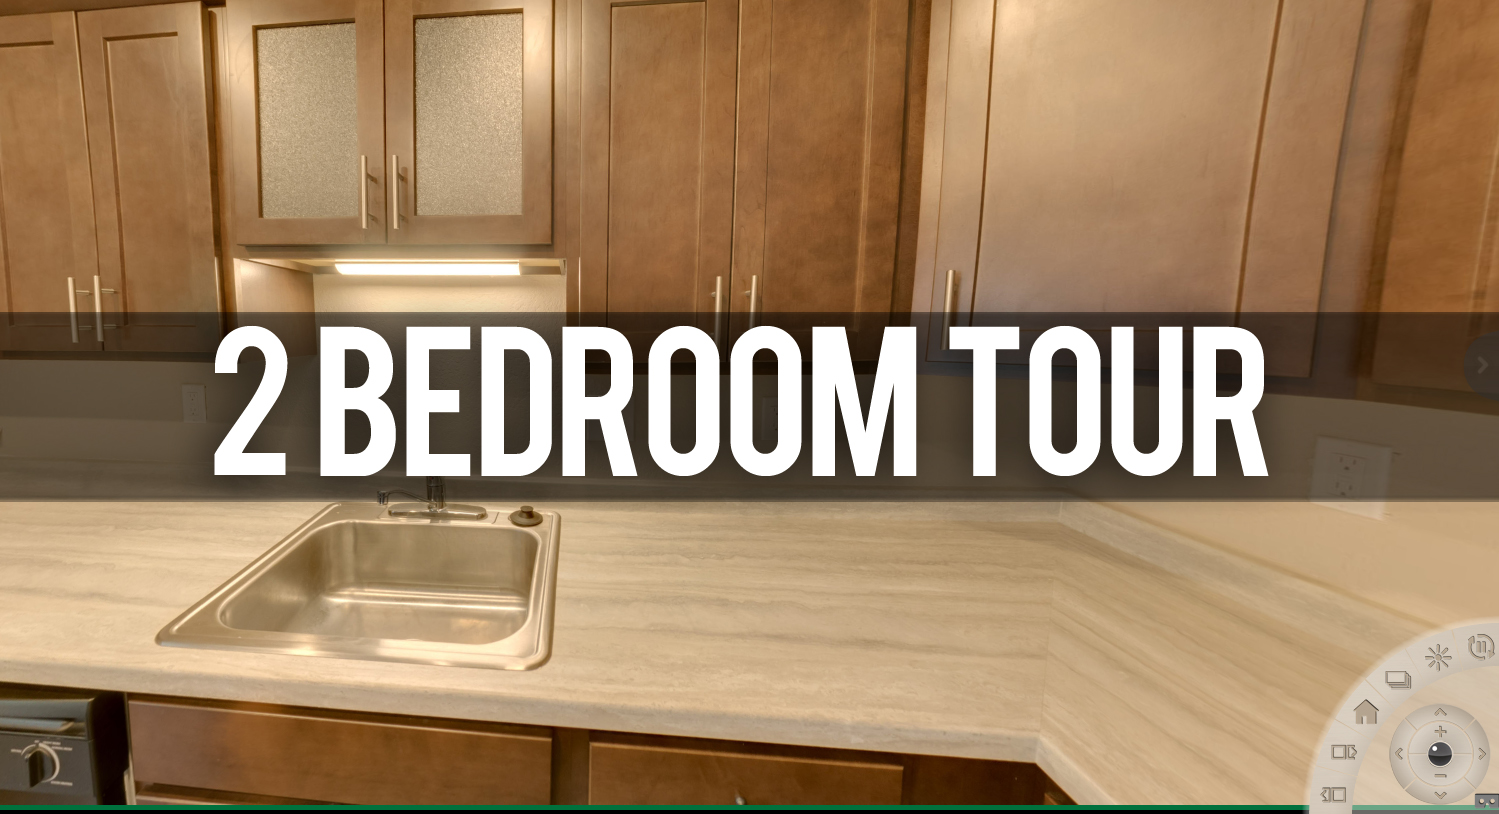 2 bedroom virtual tour Glenwood Apartments near Michigan State University